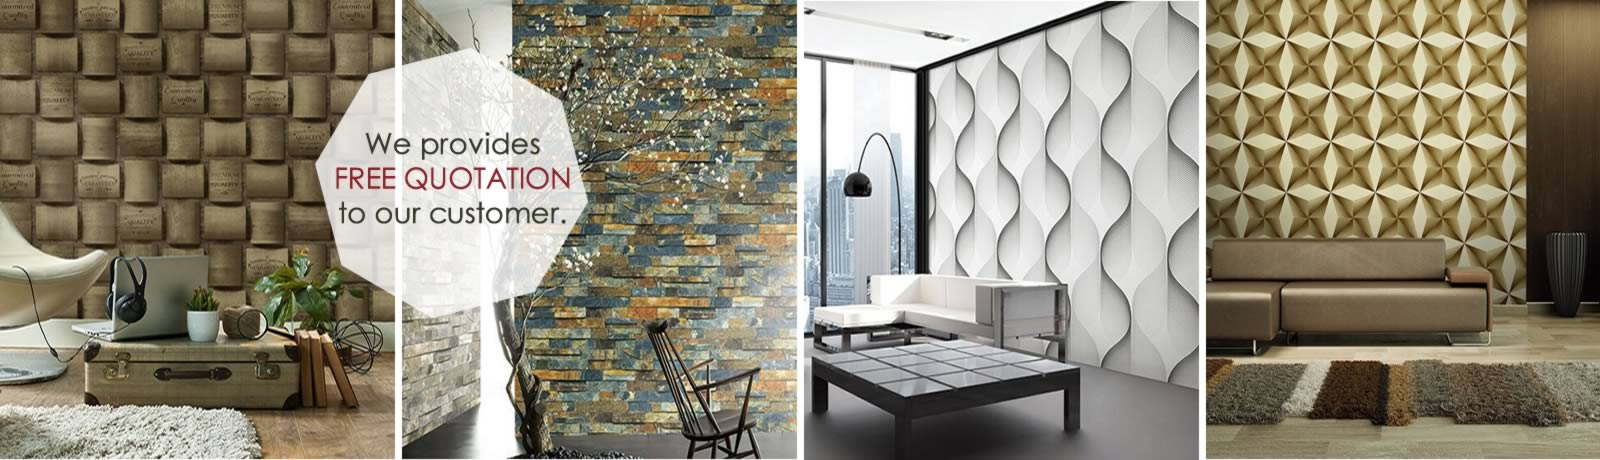 Carpet wallpaper supplier malaysia johor bahru jb for Home wallpaper kl